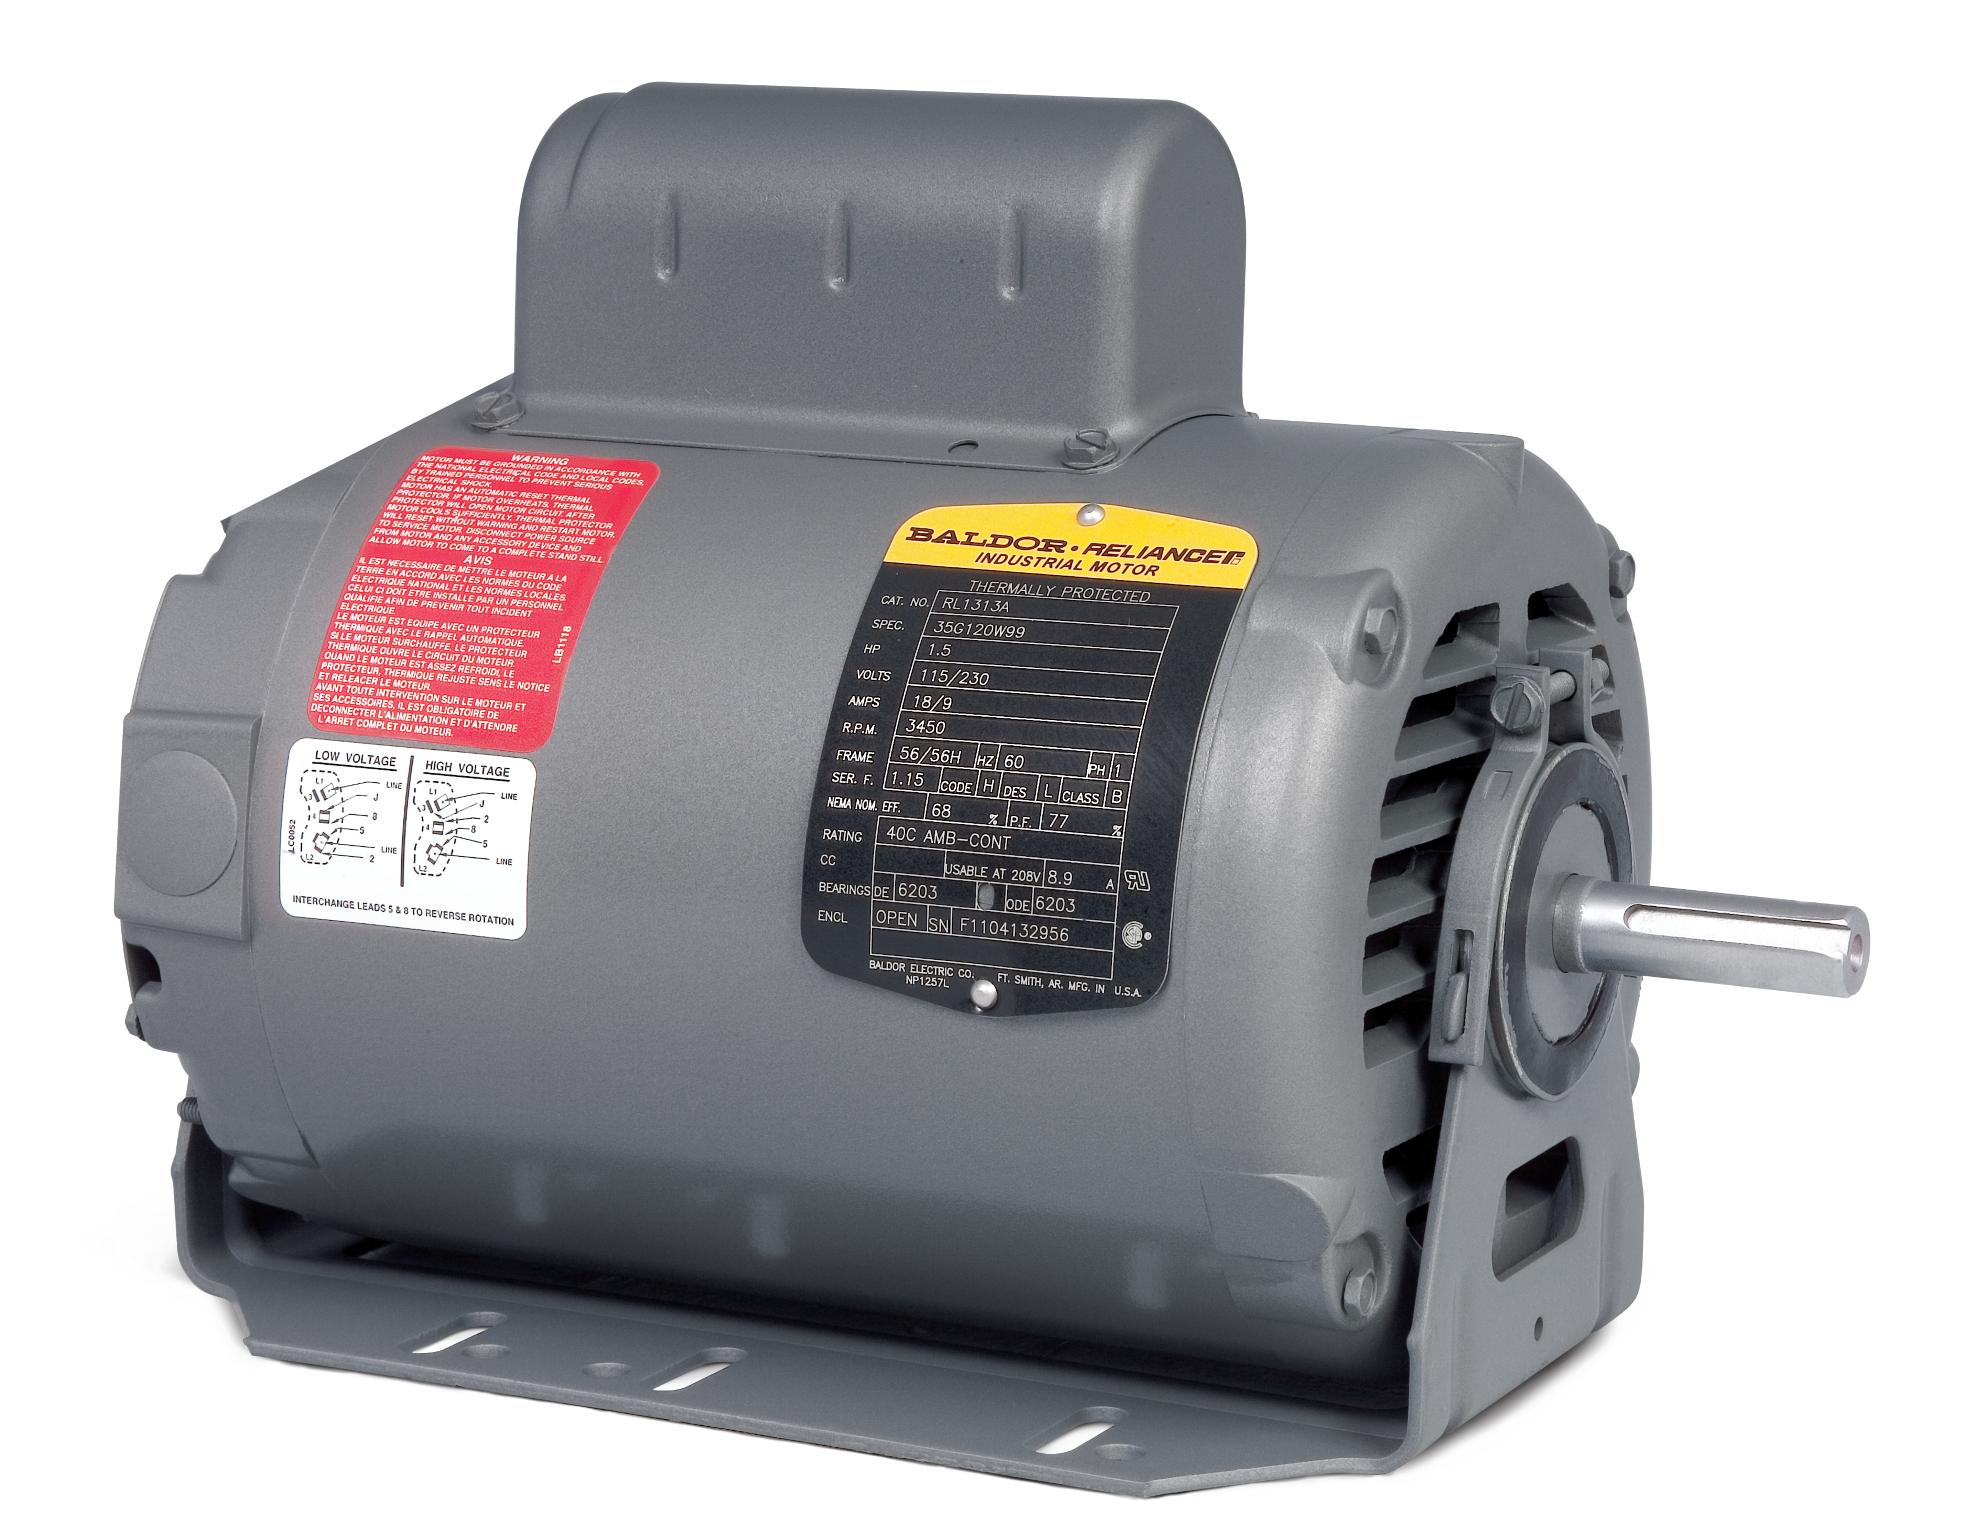 A000688 old baldor bench grinder 1 3hp wiring diagram diagram wiring  at n-0.co